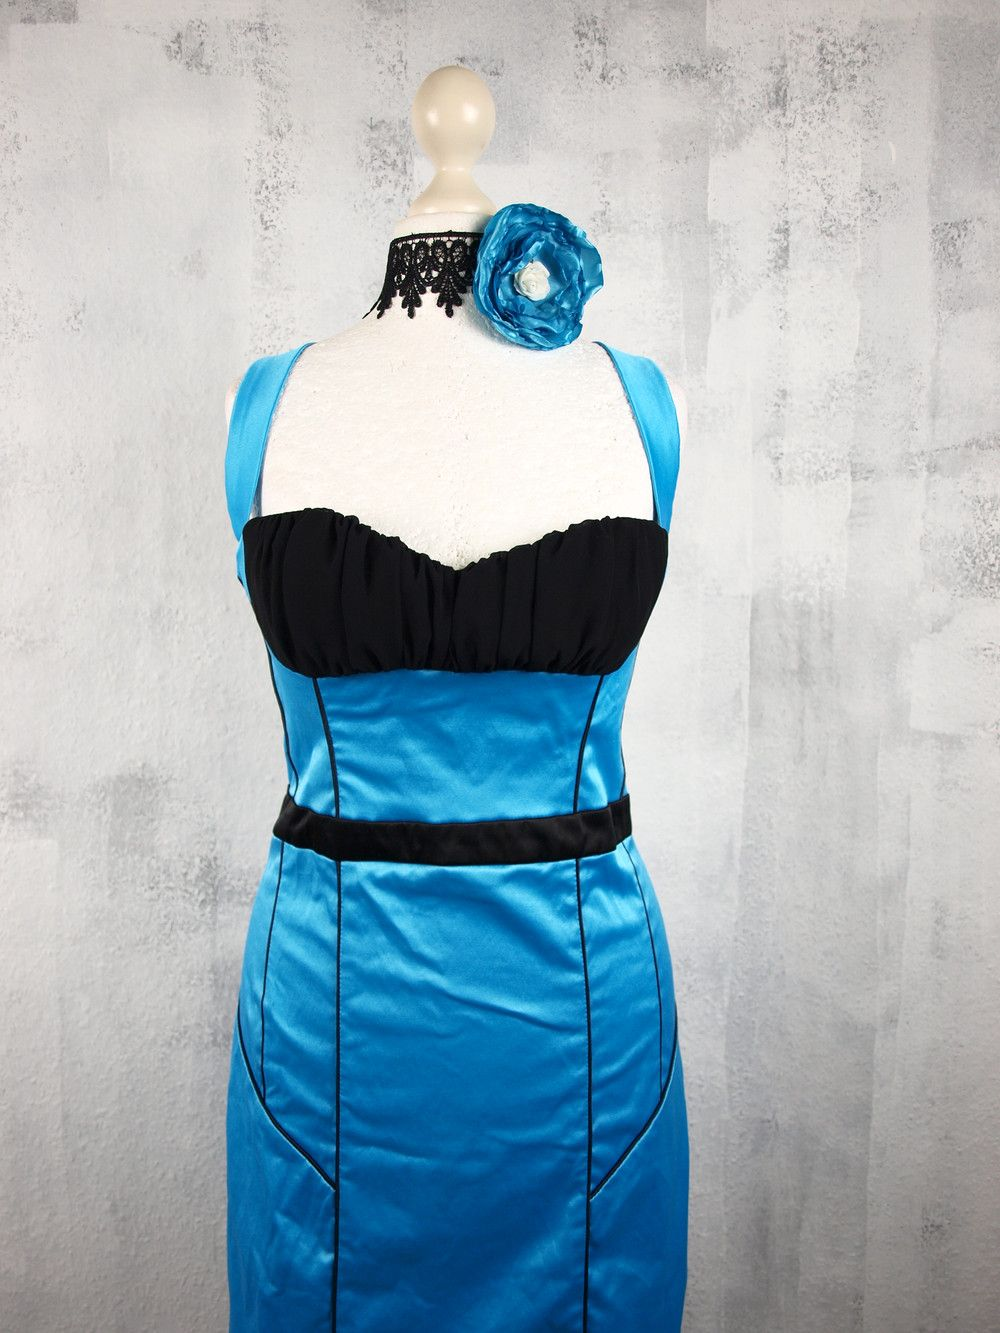 M Vintage Burlesque Kleid Blau Schwarz   Vintage burlesque ...